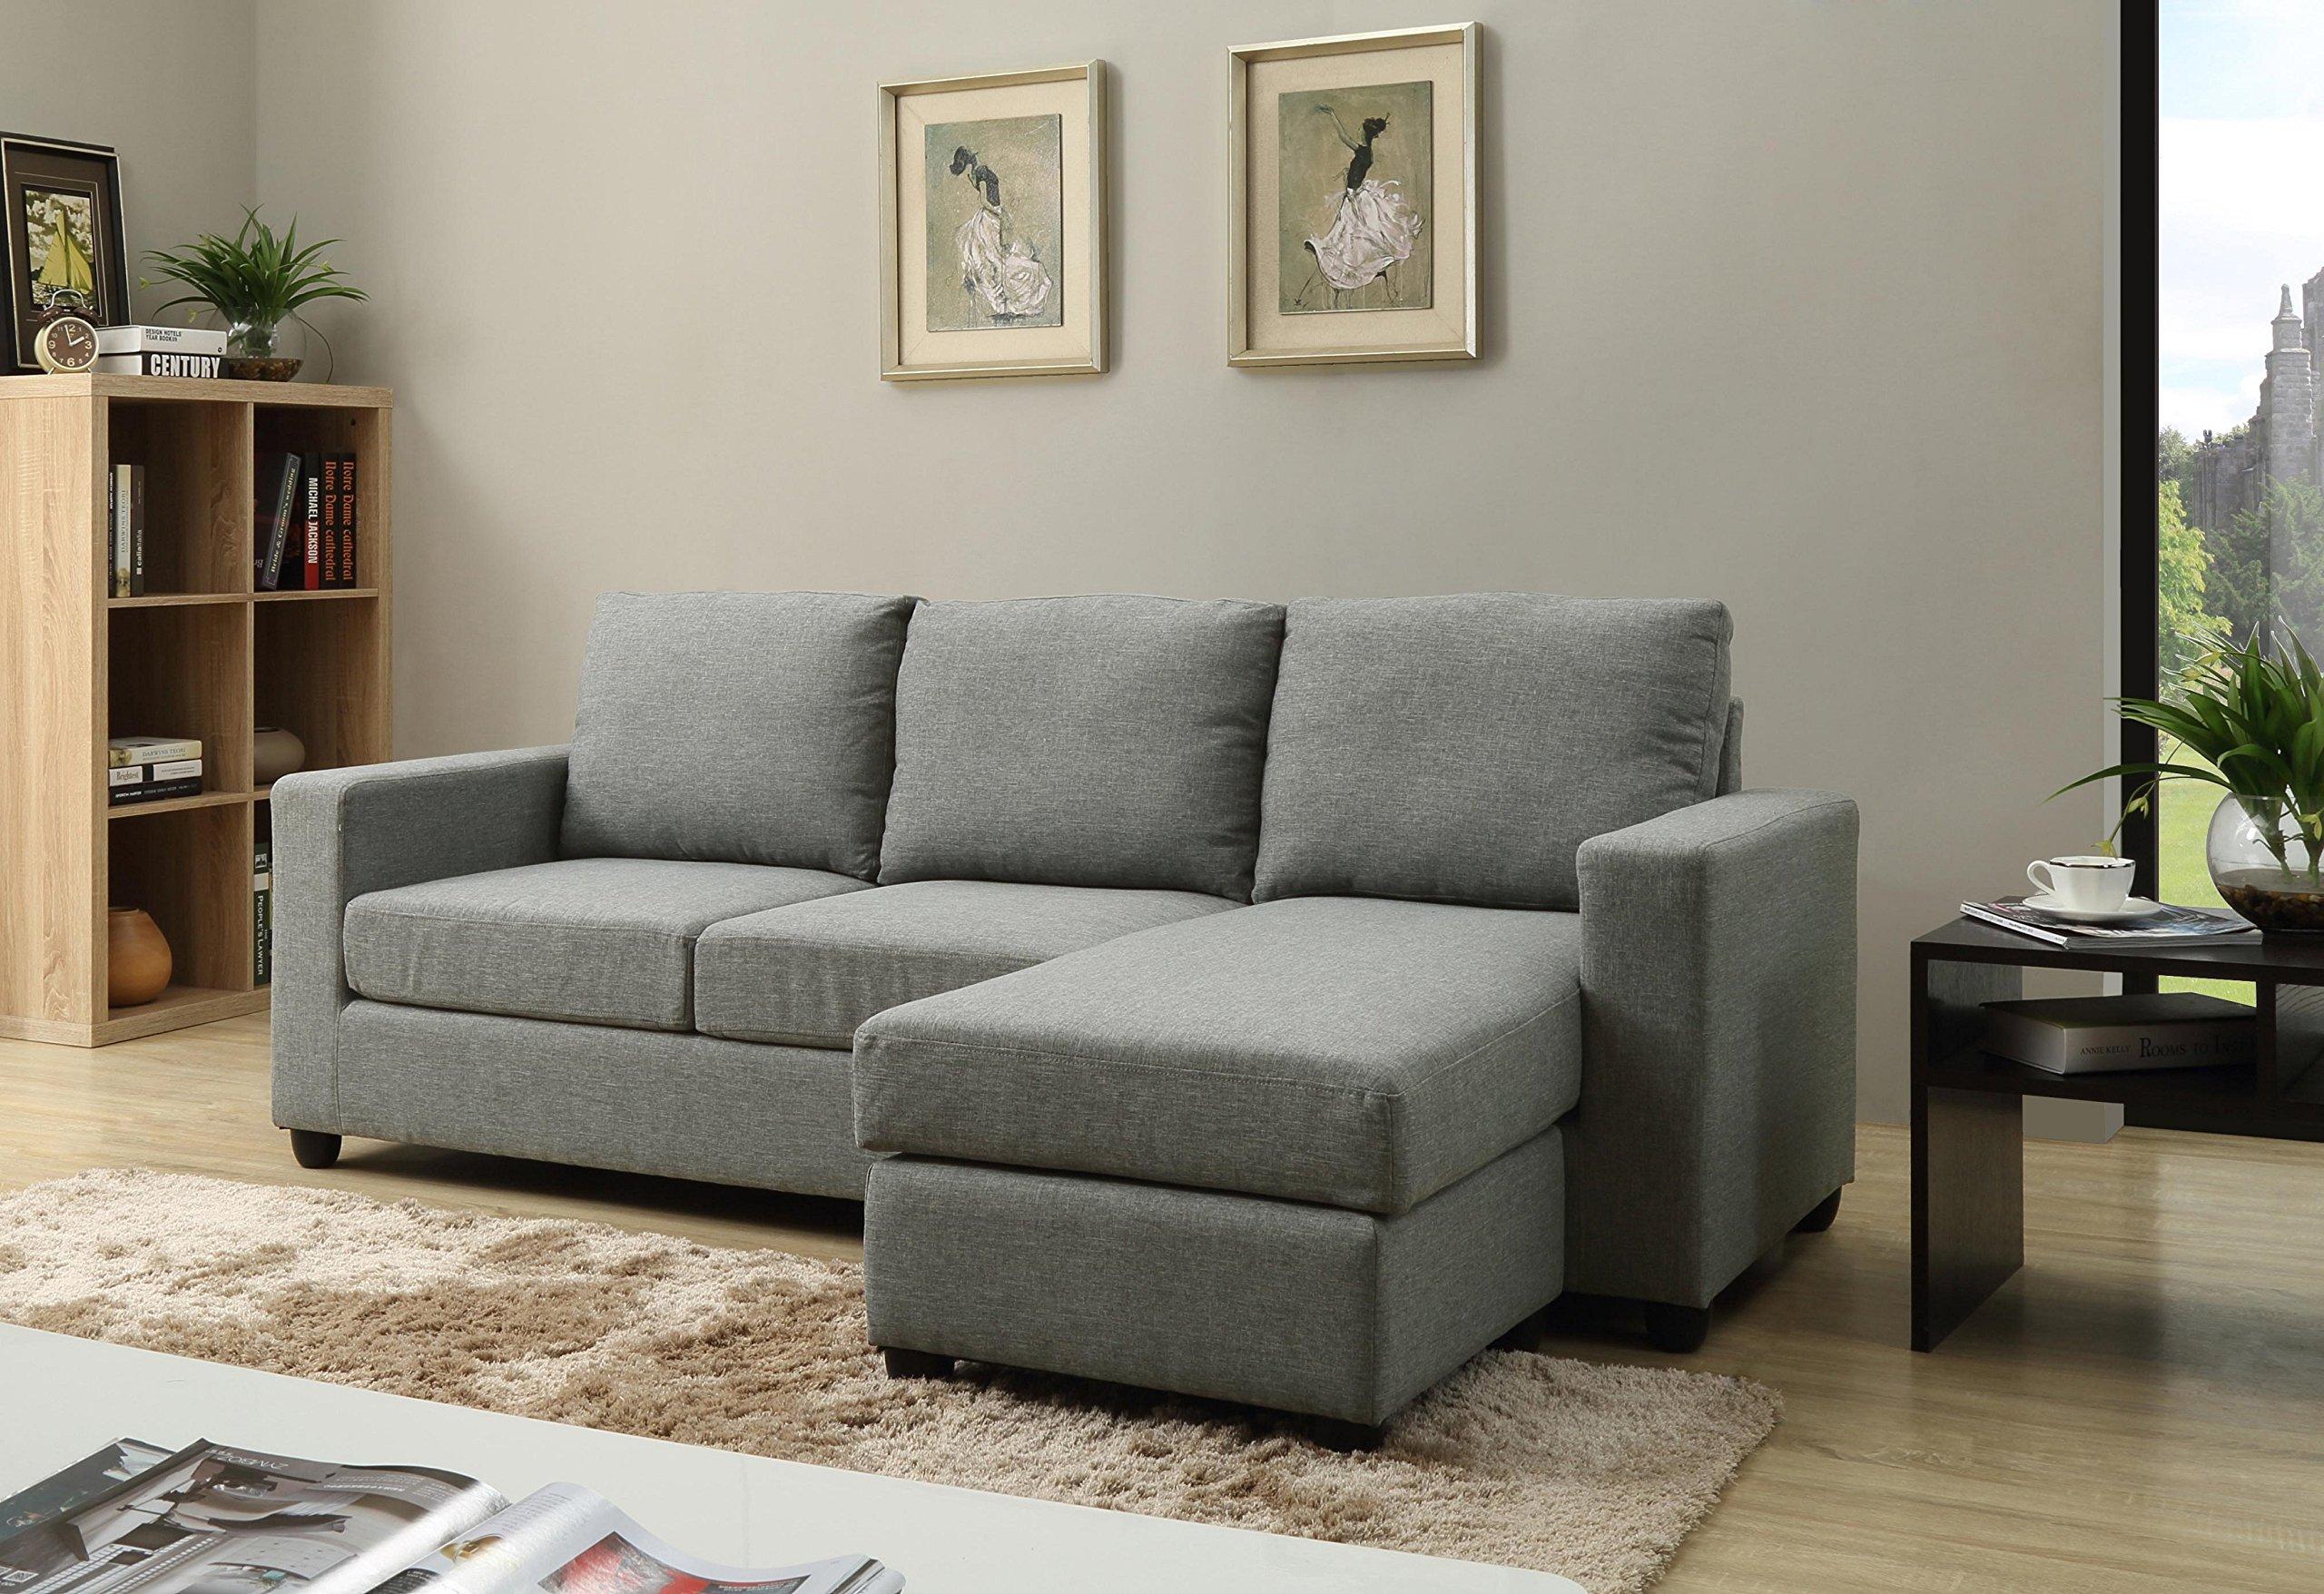 NHI Express Alexandra Convertible Sectional Sofa, Grey | eBay